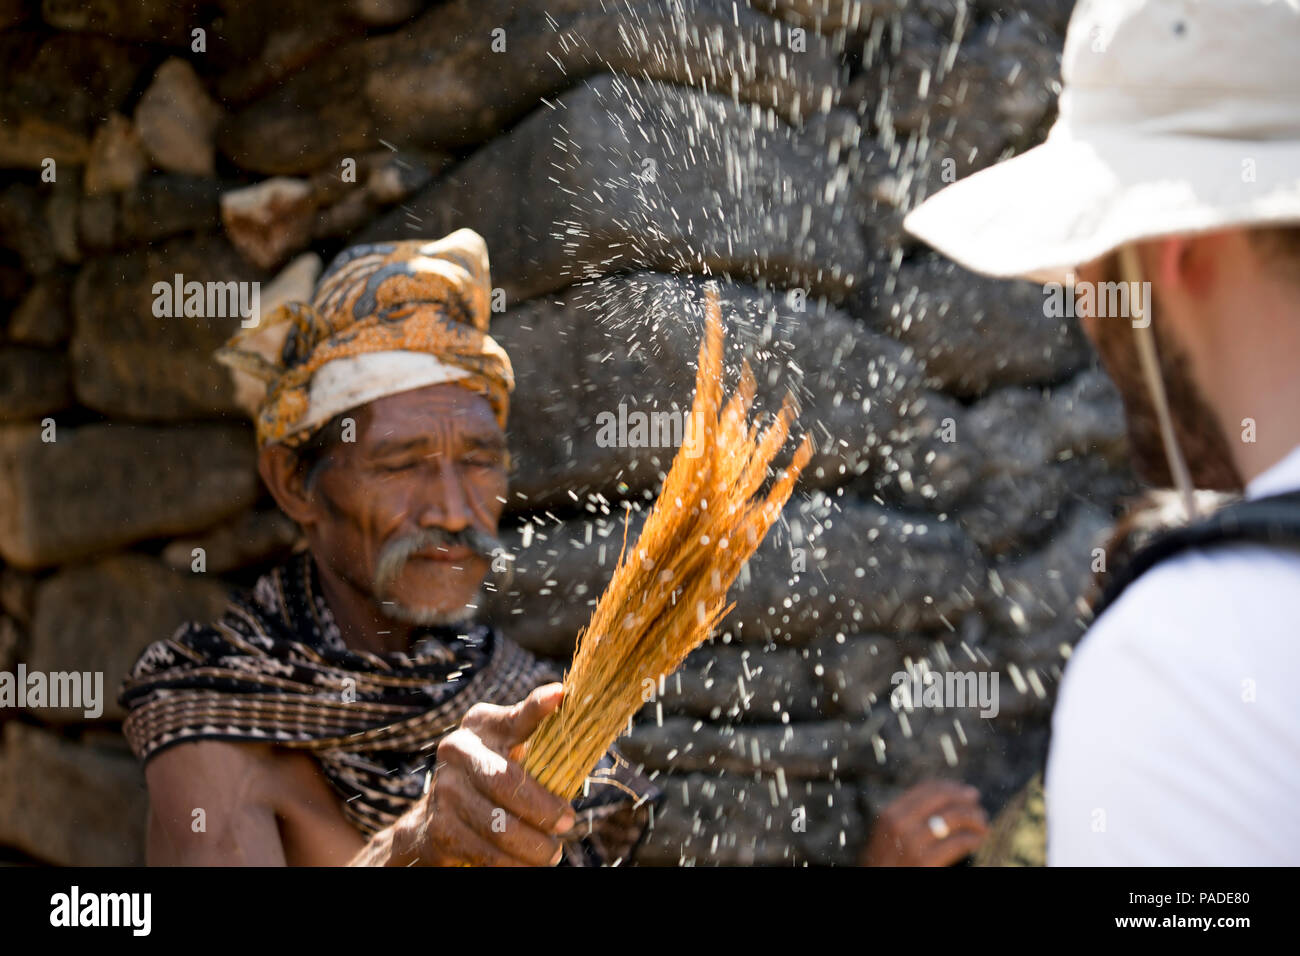 Rituel de purification accueillant, Seba Savu, Indonésie Photo Stock